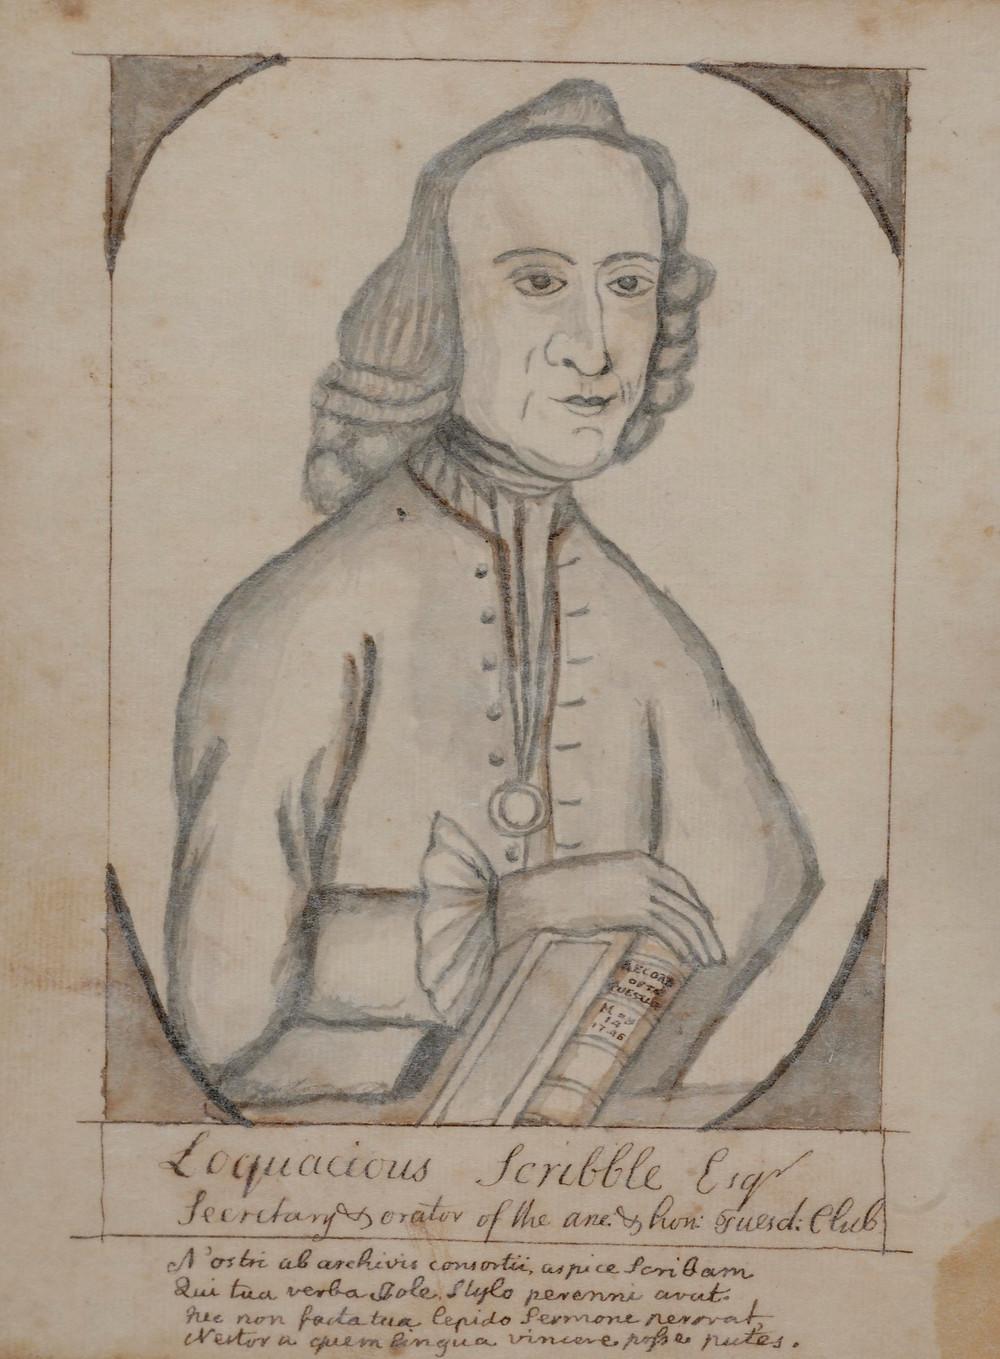 Caricature of Annapolis-based doctor Alexander Hamilton.